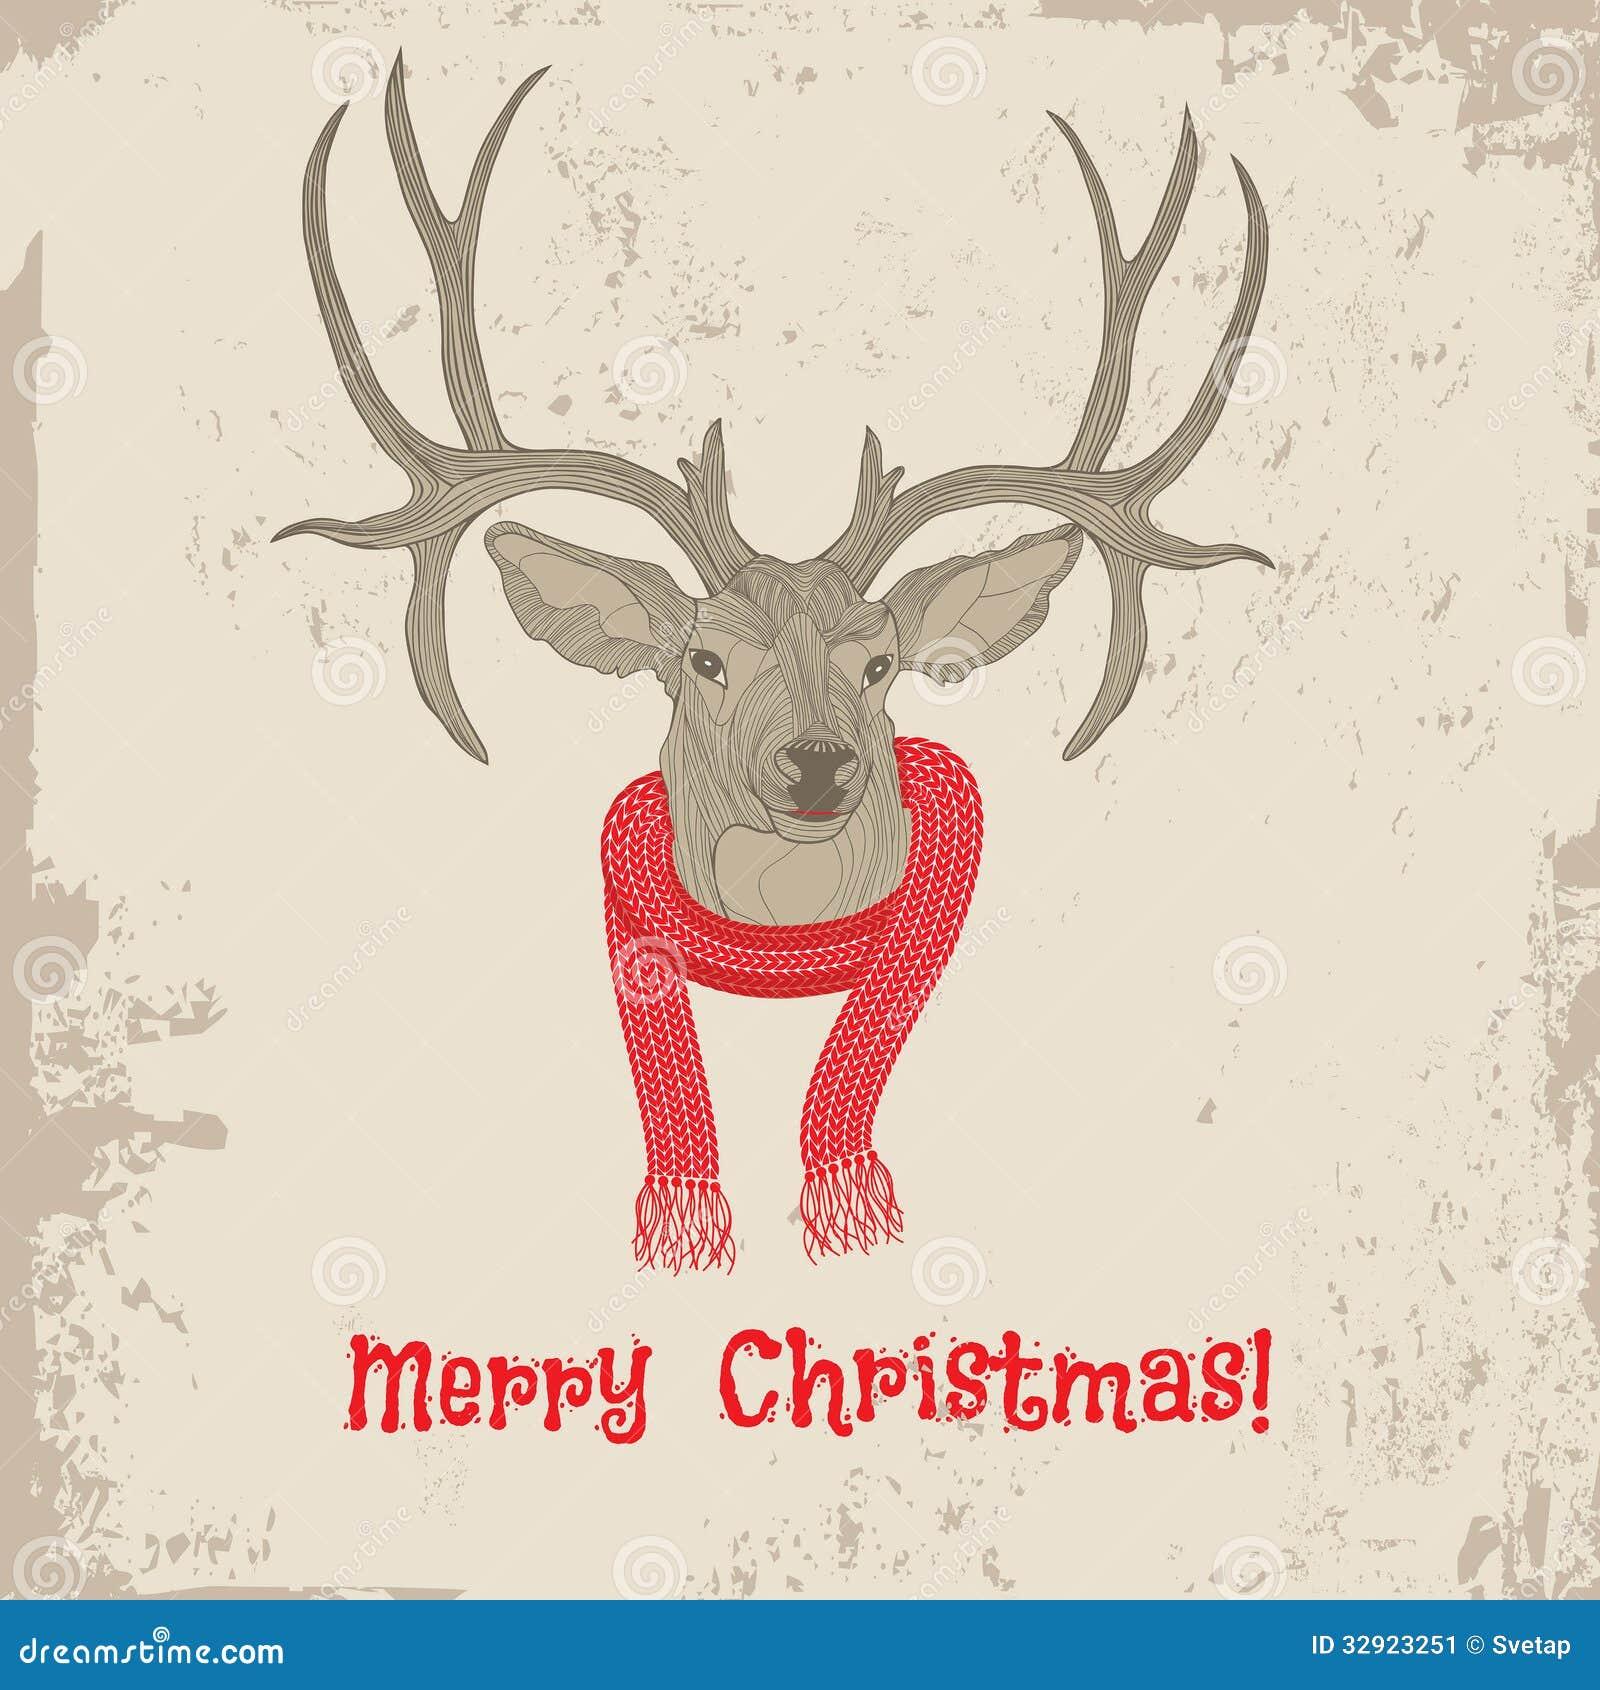 Christmas Deer Sketch Stock Vector - Image: 45265598